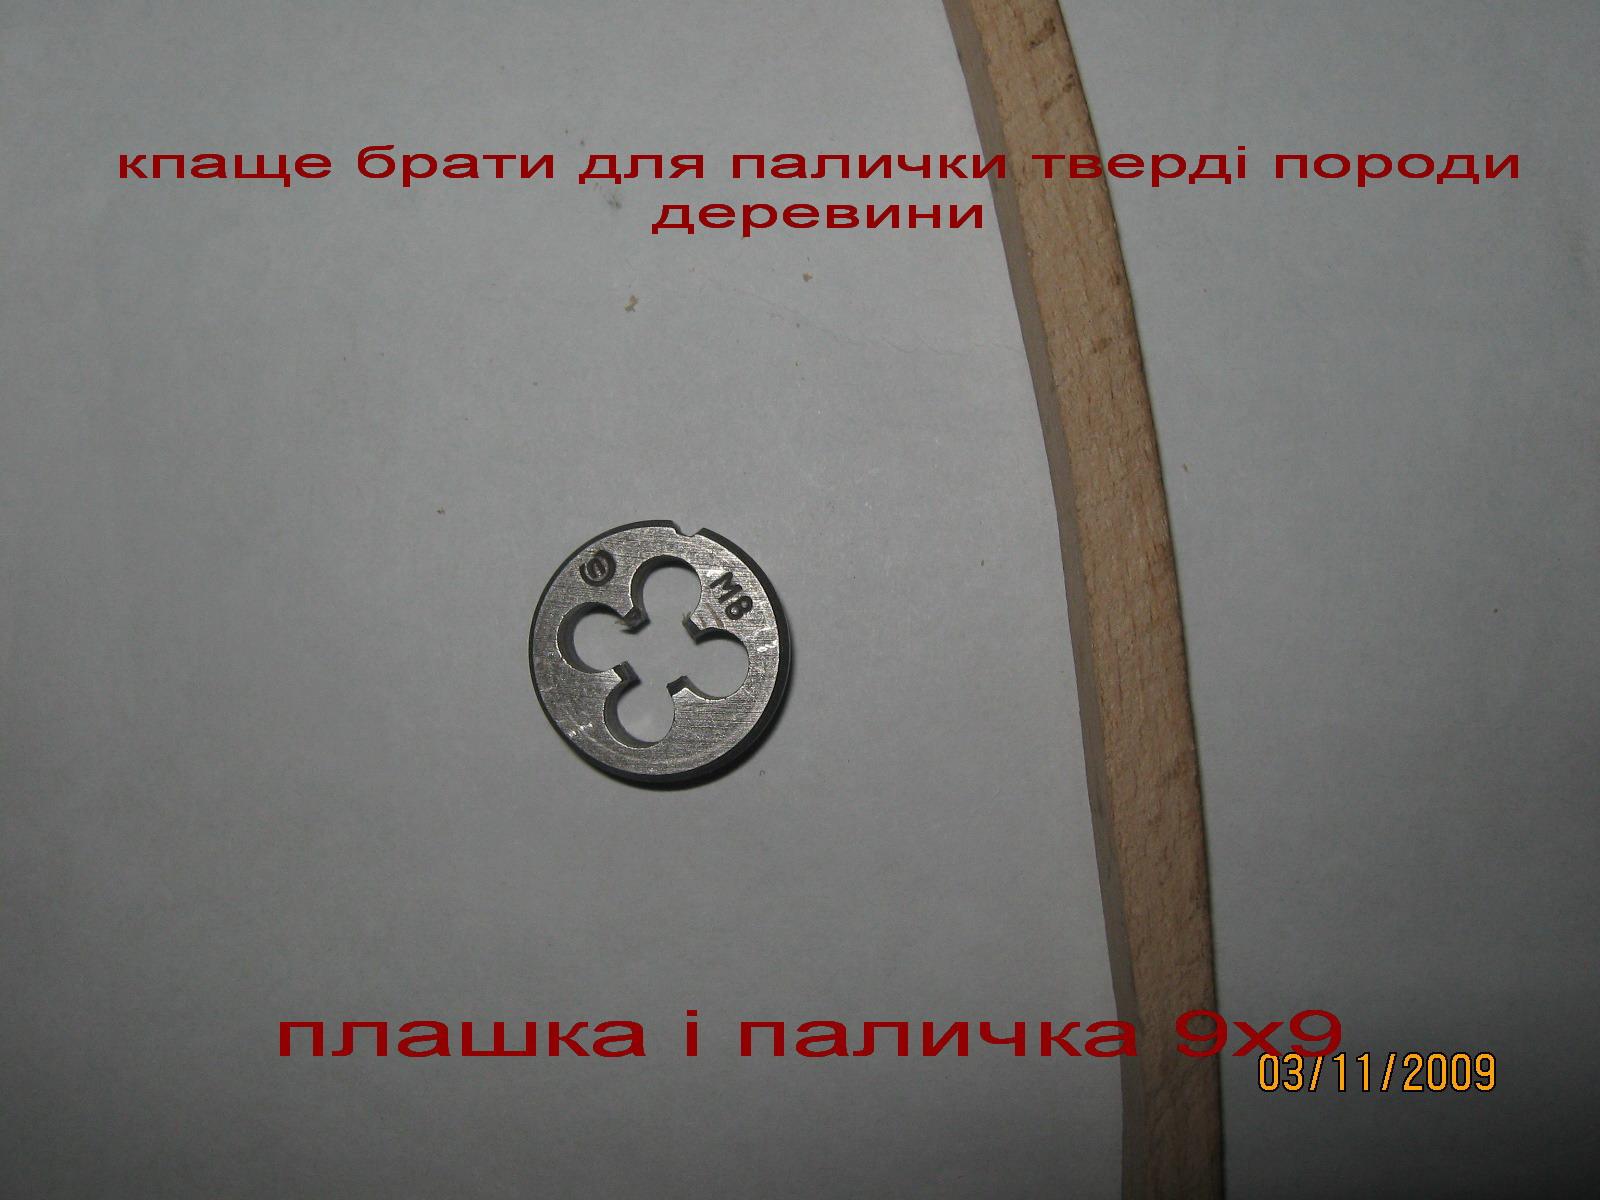 8094_4ee280ade9398.jpg 1600X1200 px